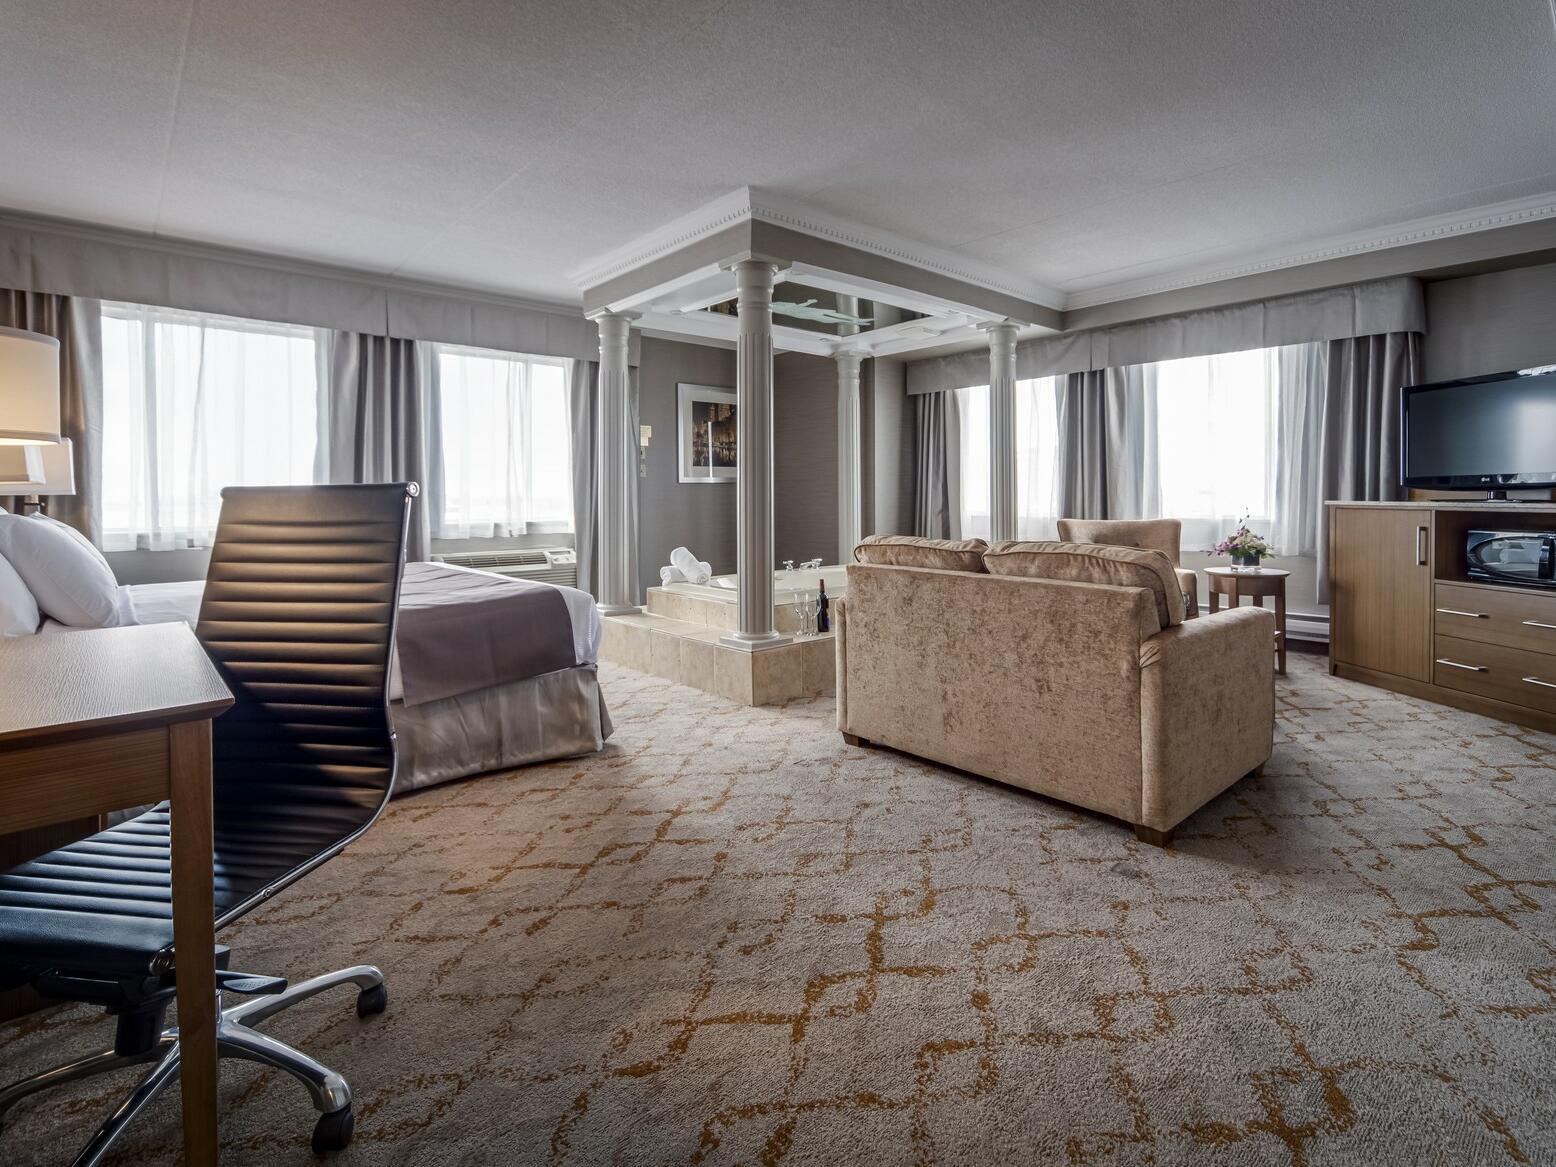 Deluxe King Jacuzzi Suite at Monte Carlo Inn Vaughan Suites